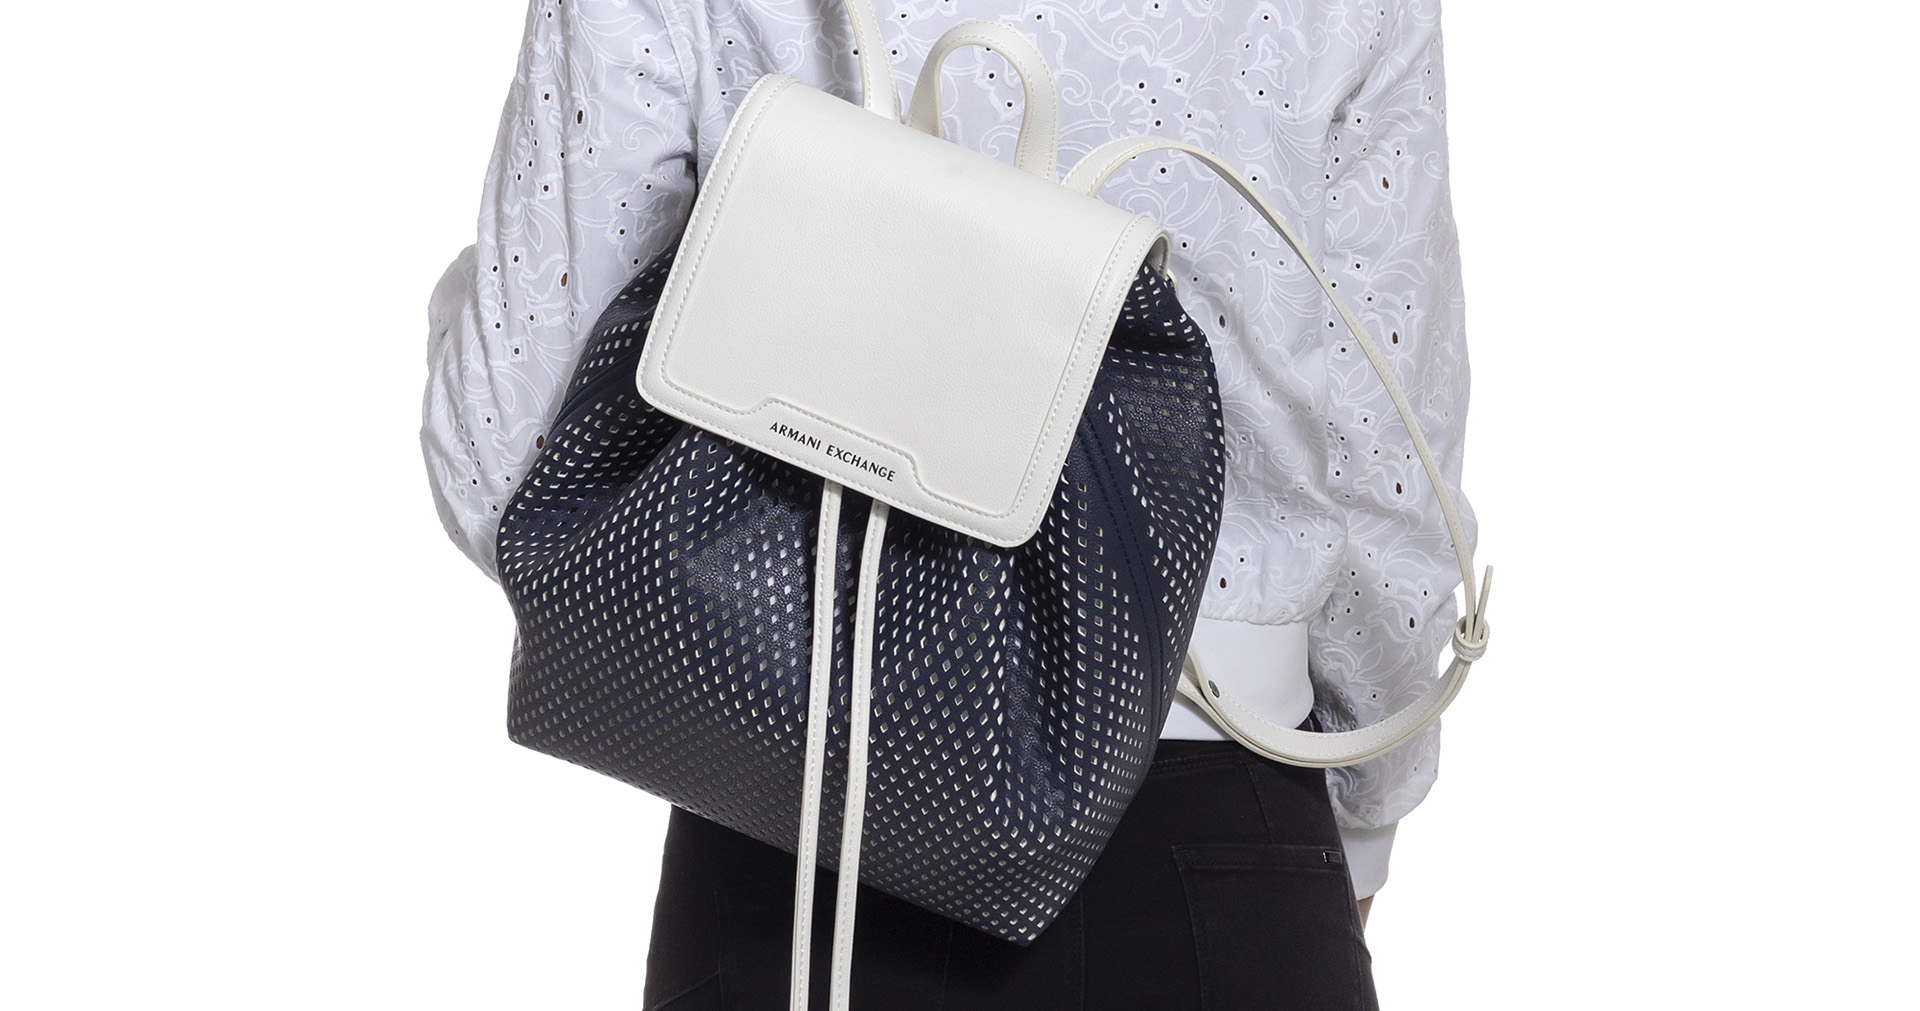 Product Photography, Ladies handbag